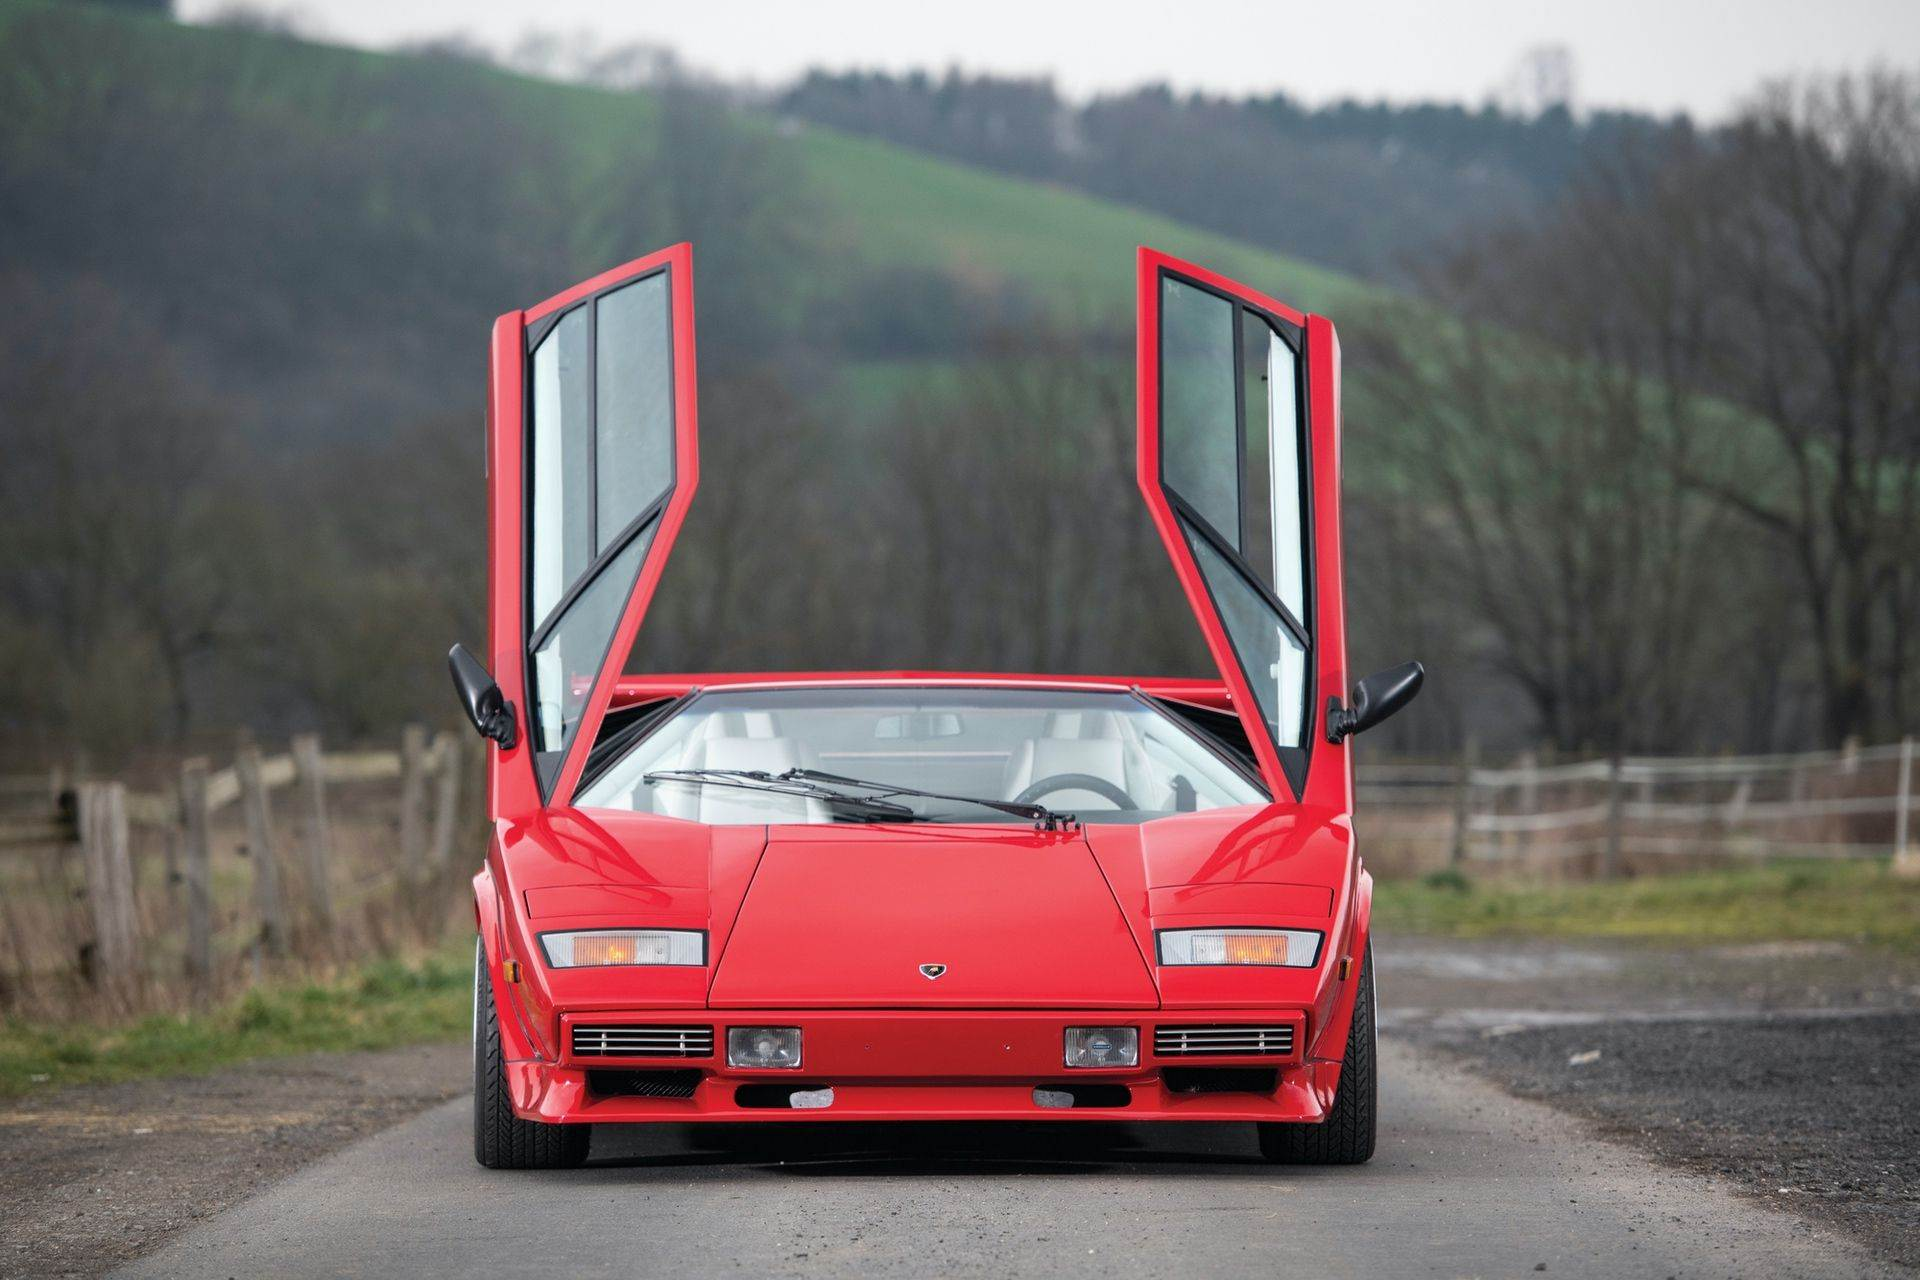 Lamborghini_Countach_5000S_0004